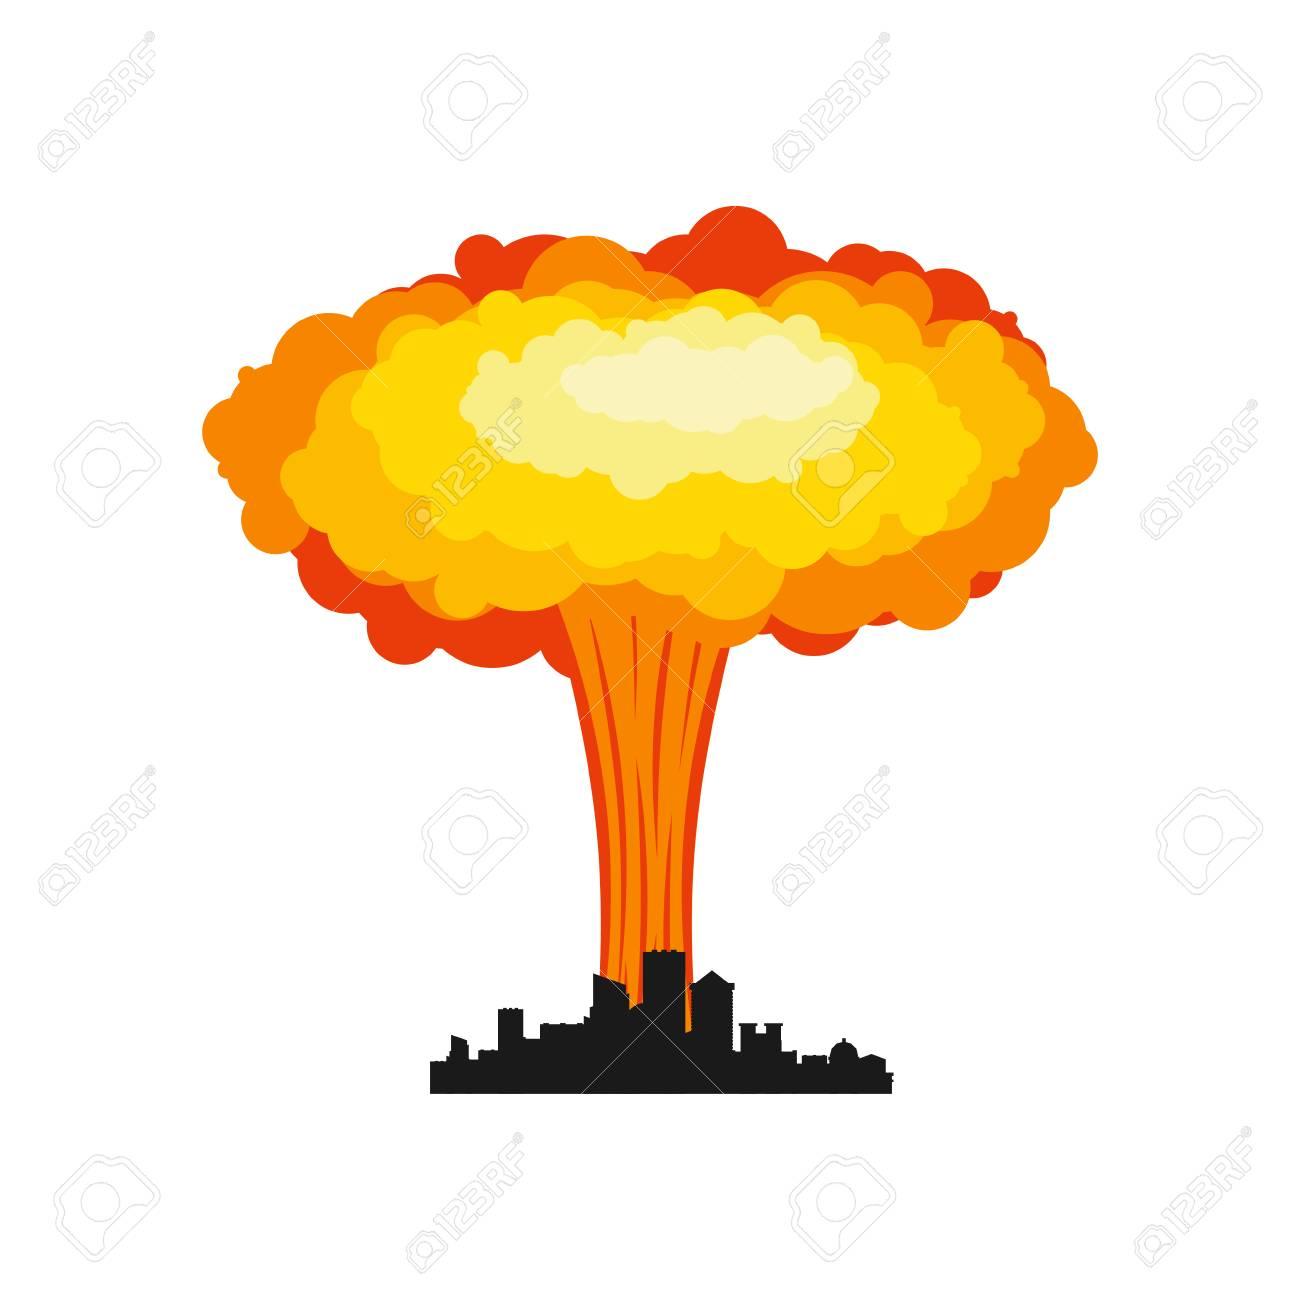 Explosion clipart war. Nuke x free clip